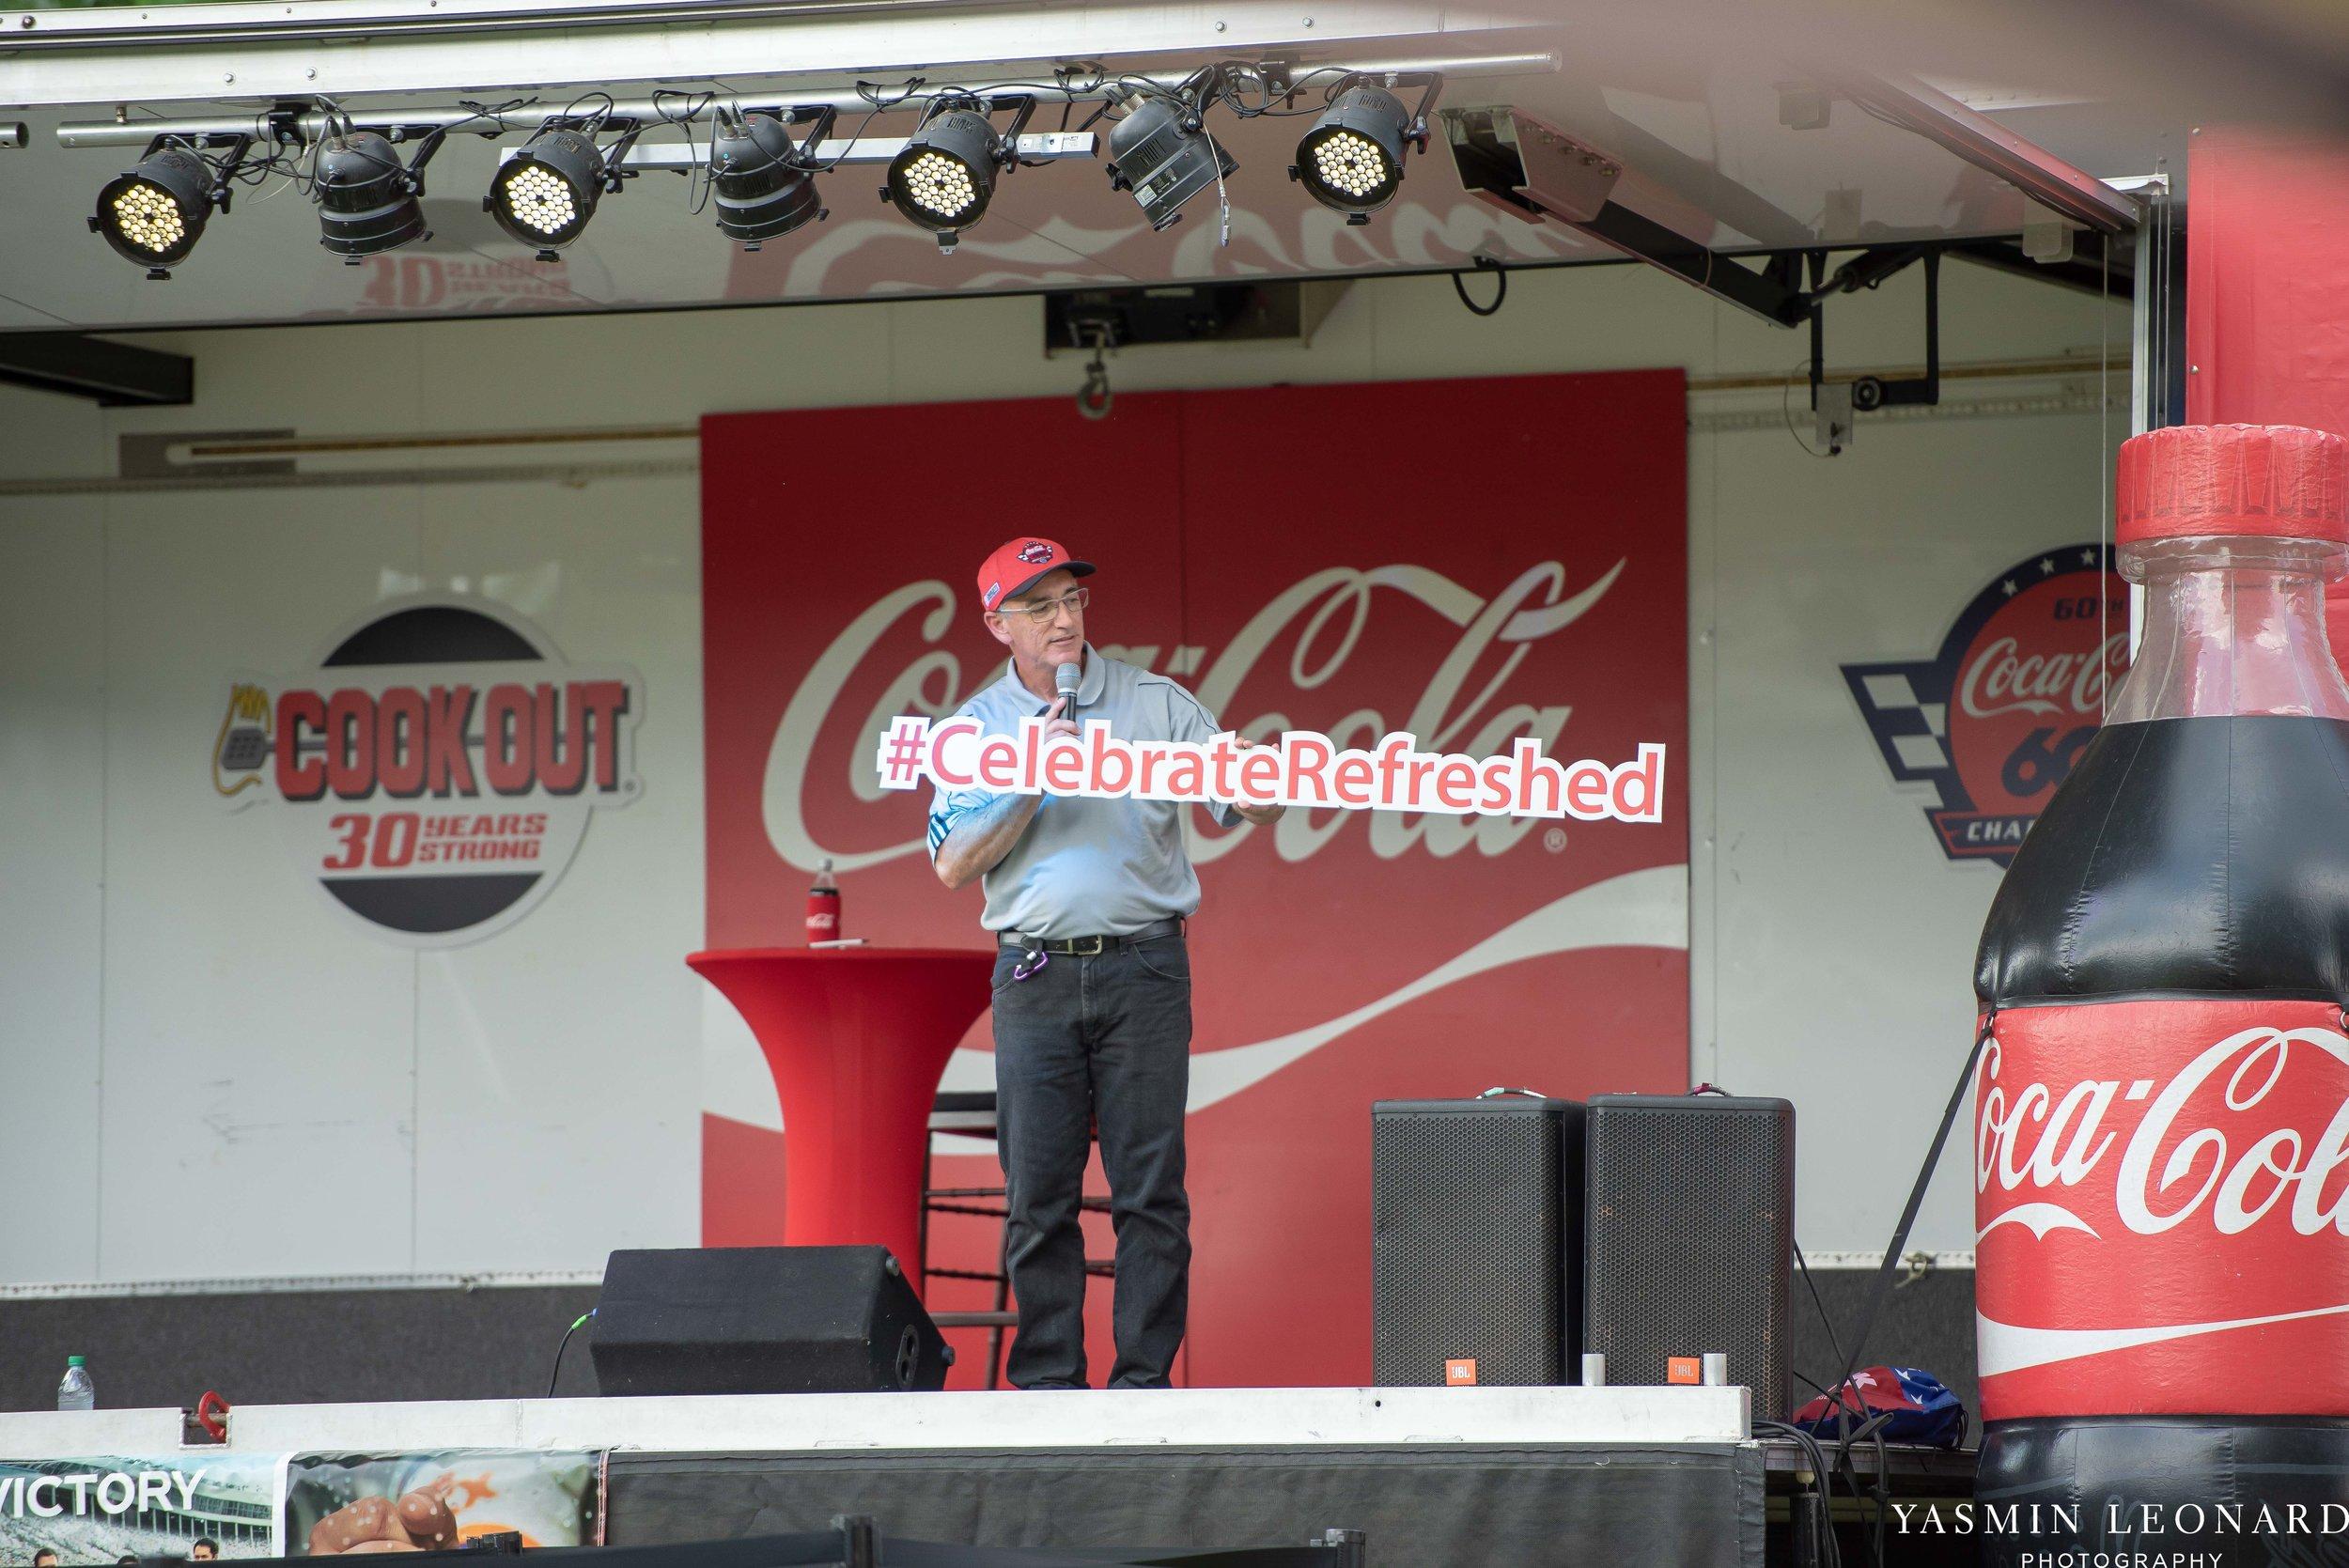 Cookout - CocaCola 600 - Coca Cola - Austin Dillon - Nascar - Nascar Meet and Greet - Yasmin Leonard Photography-6.jpg